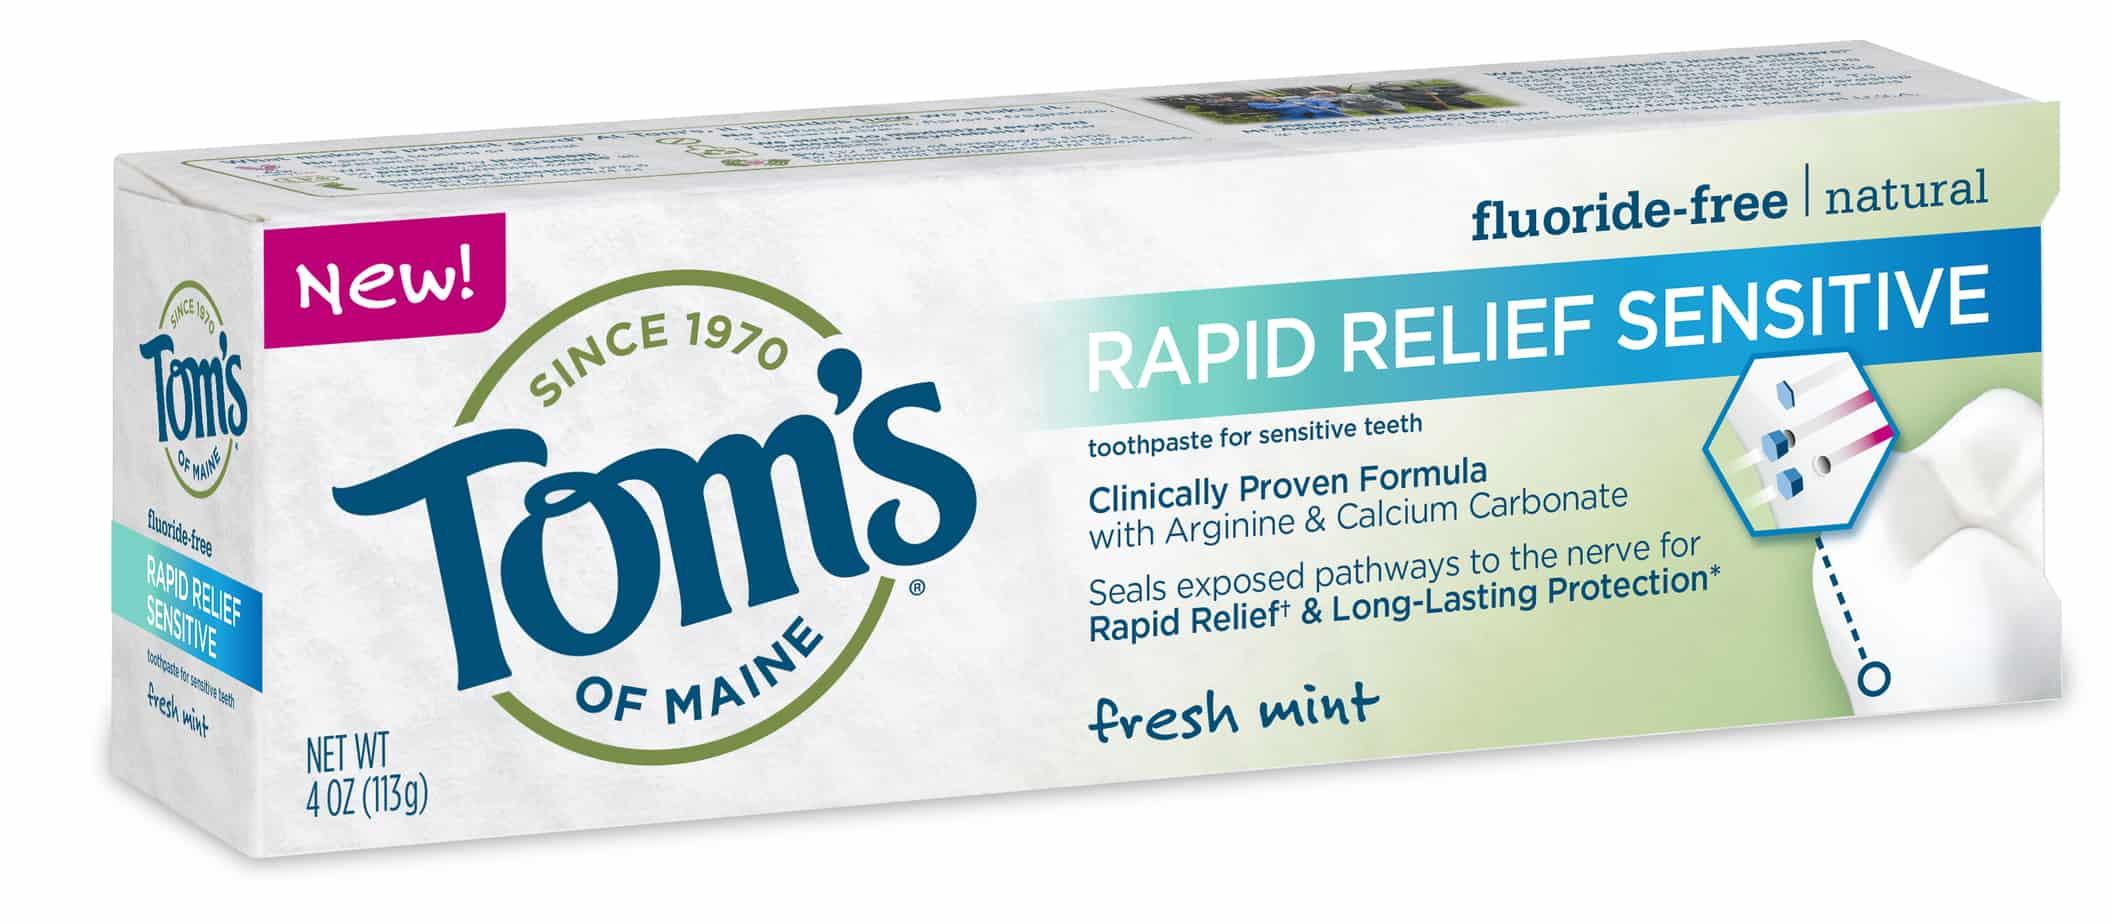 Tom's of Maine Rapid Relief